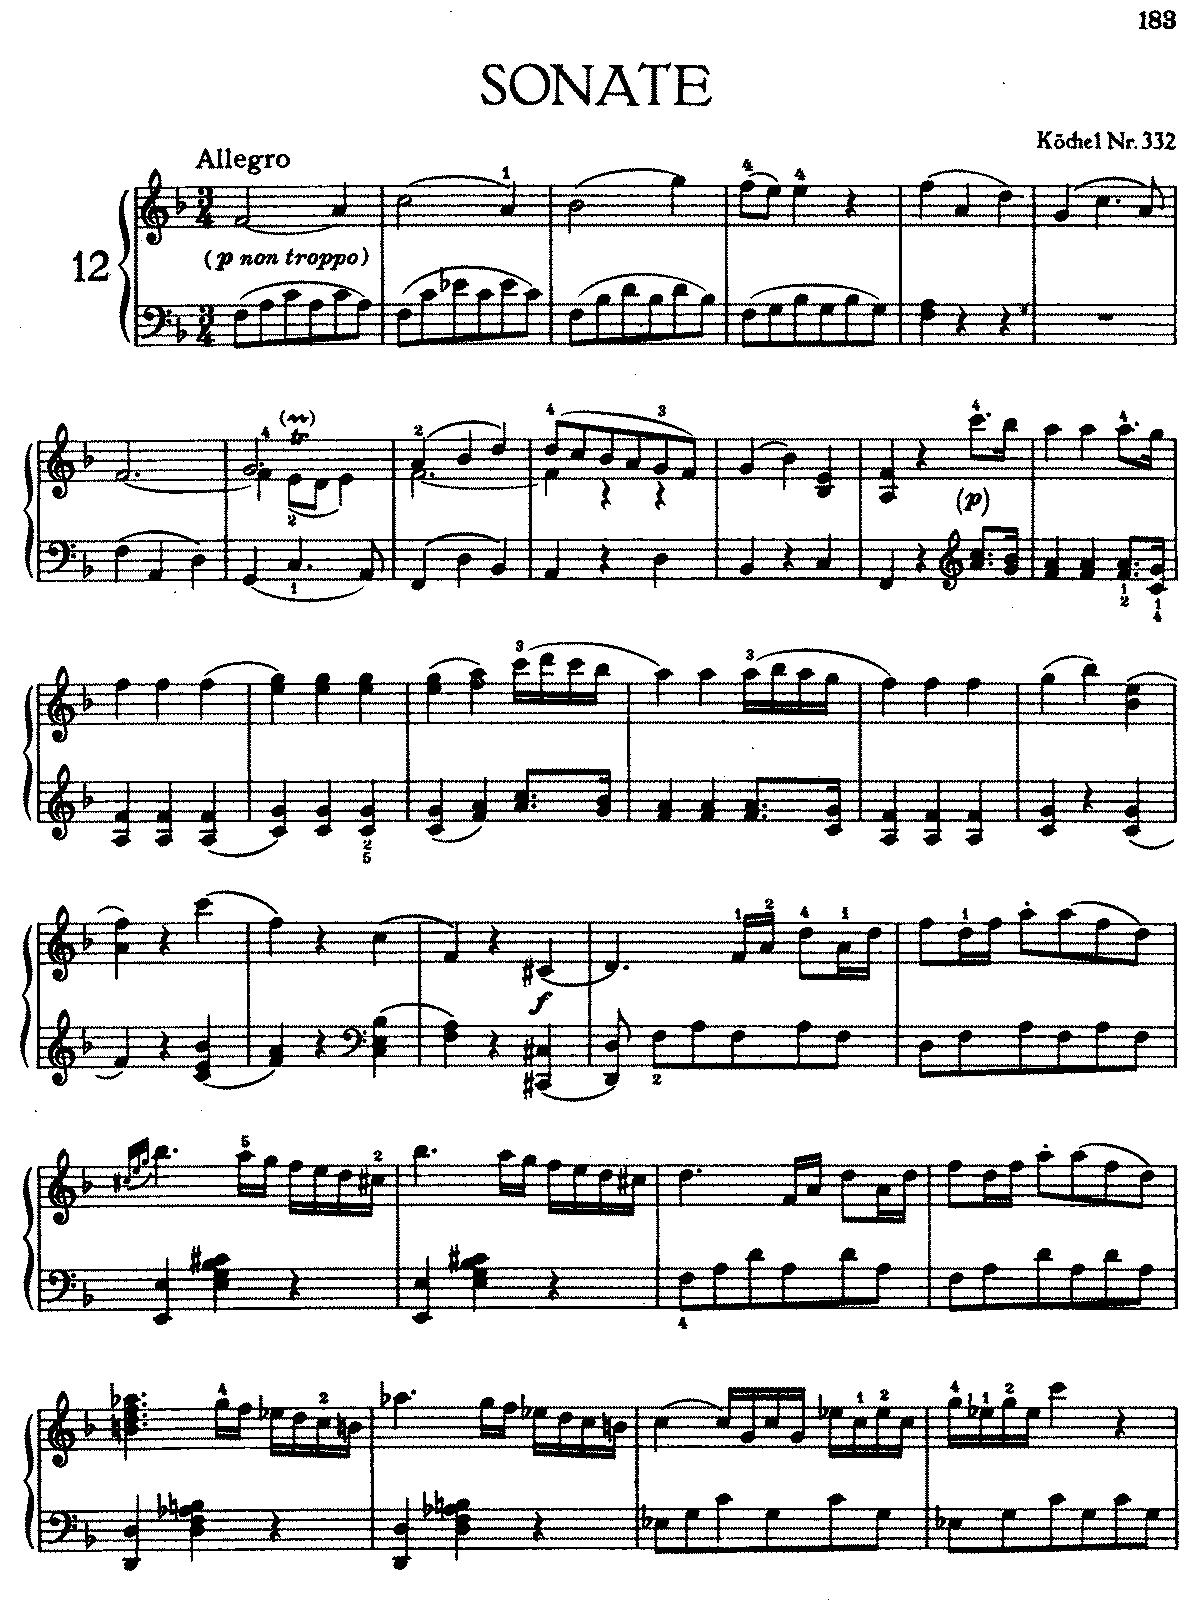 K. 332 First Movement Analysis